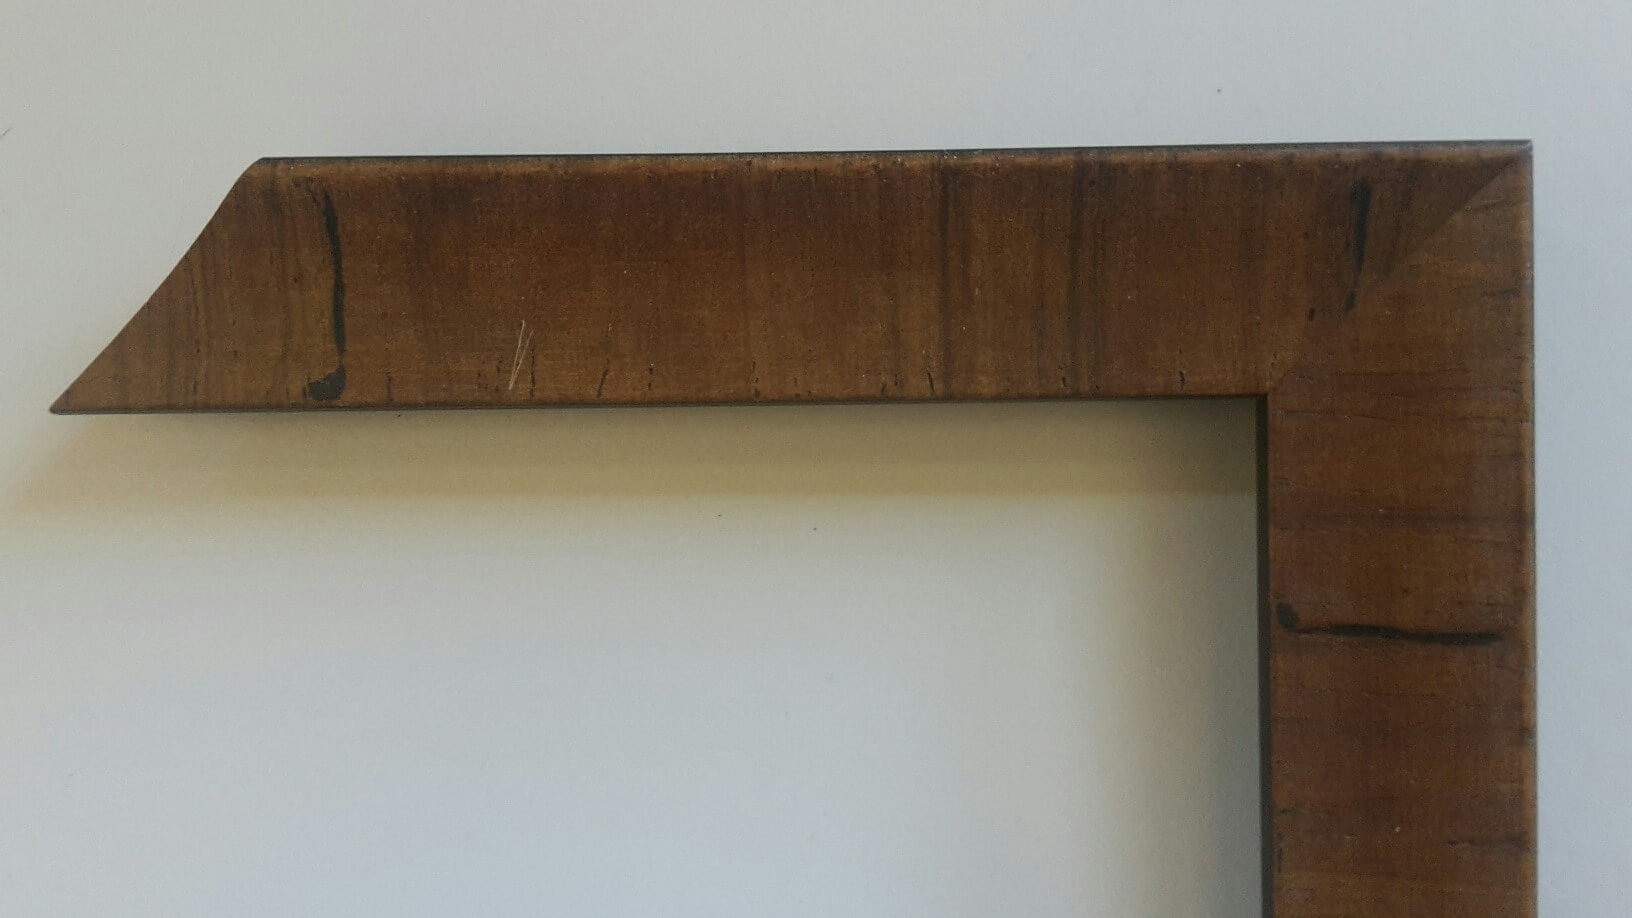 Fabira Tuco Wurzelfurnier Hellbraun, Rücken Schwarz ca. 30mm × 23mm